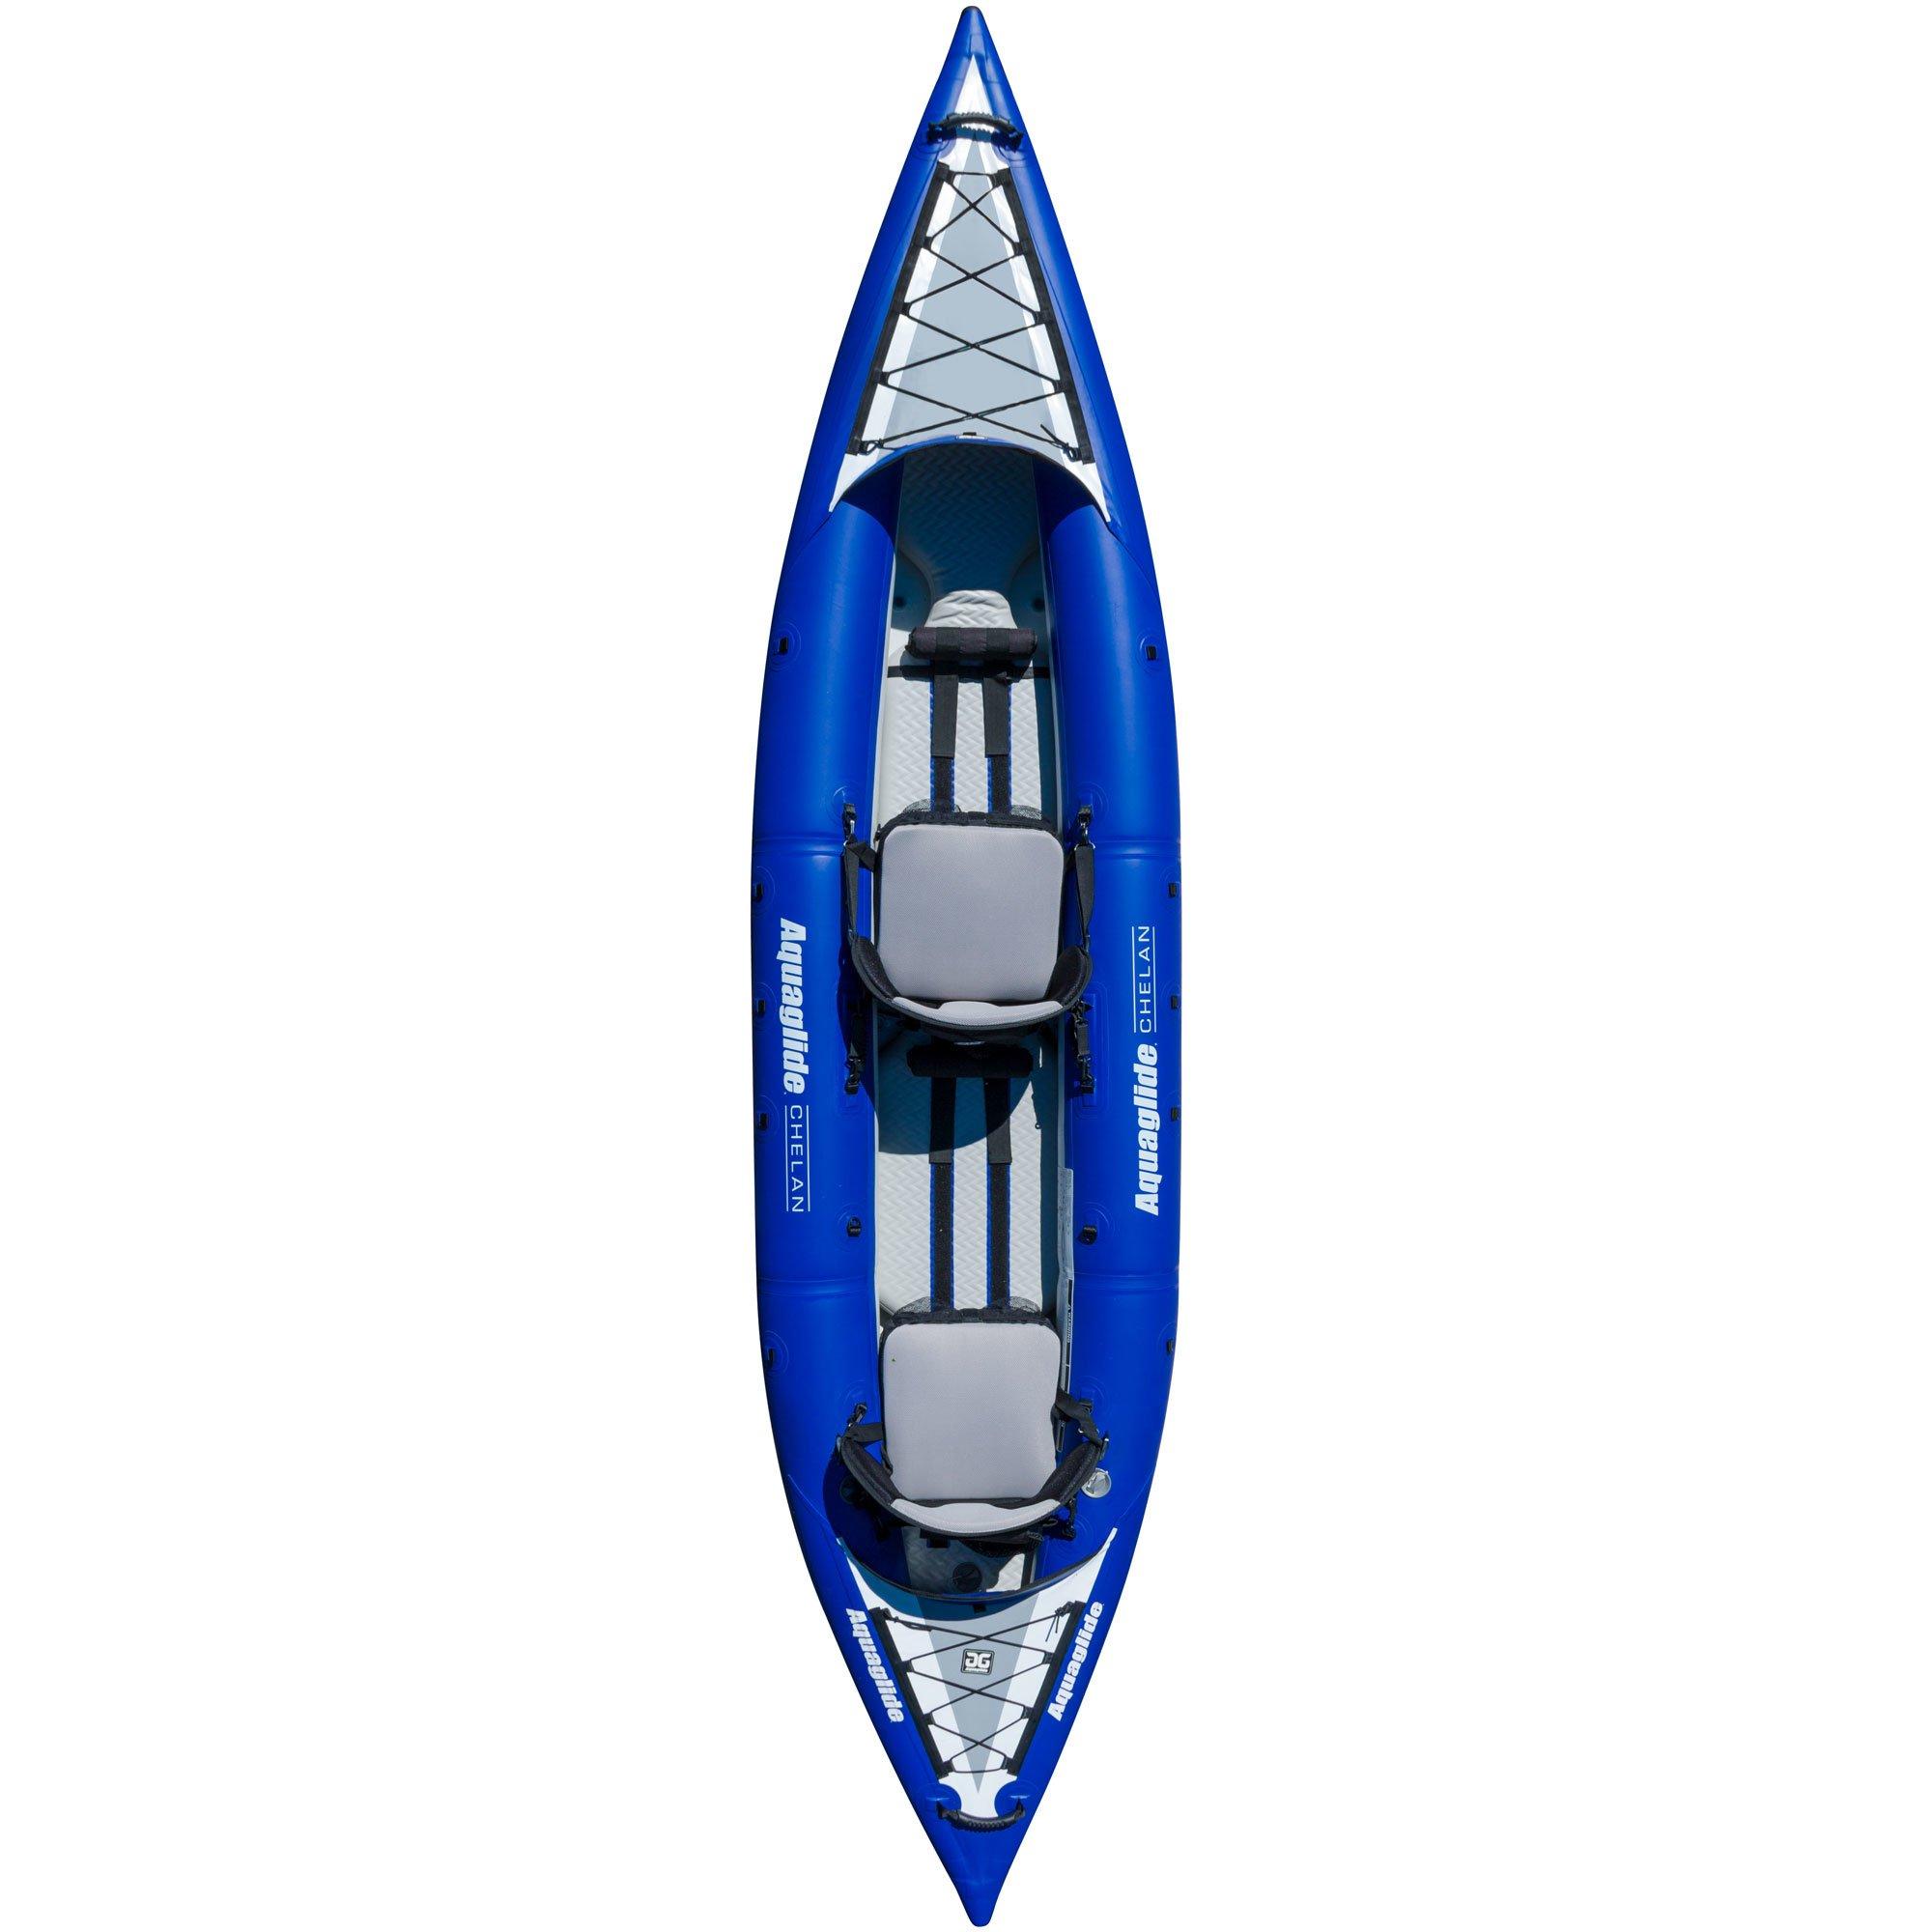 Chelan 140 HB - Inflatable Kayak